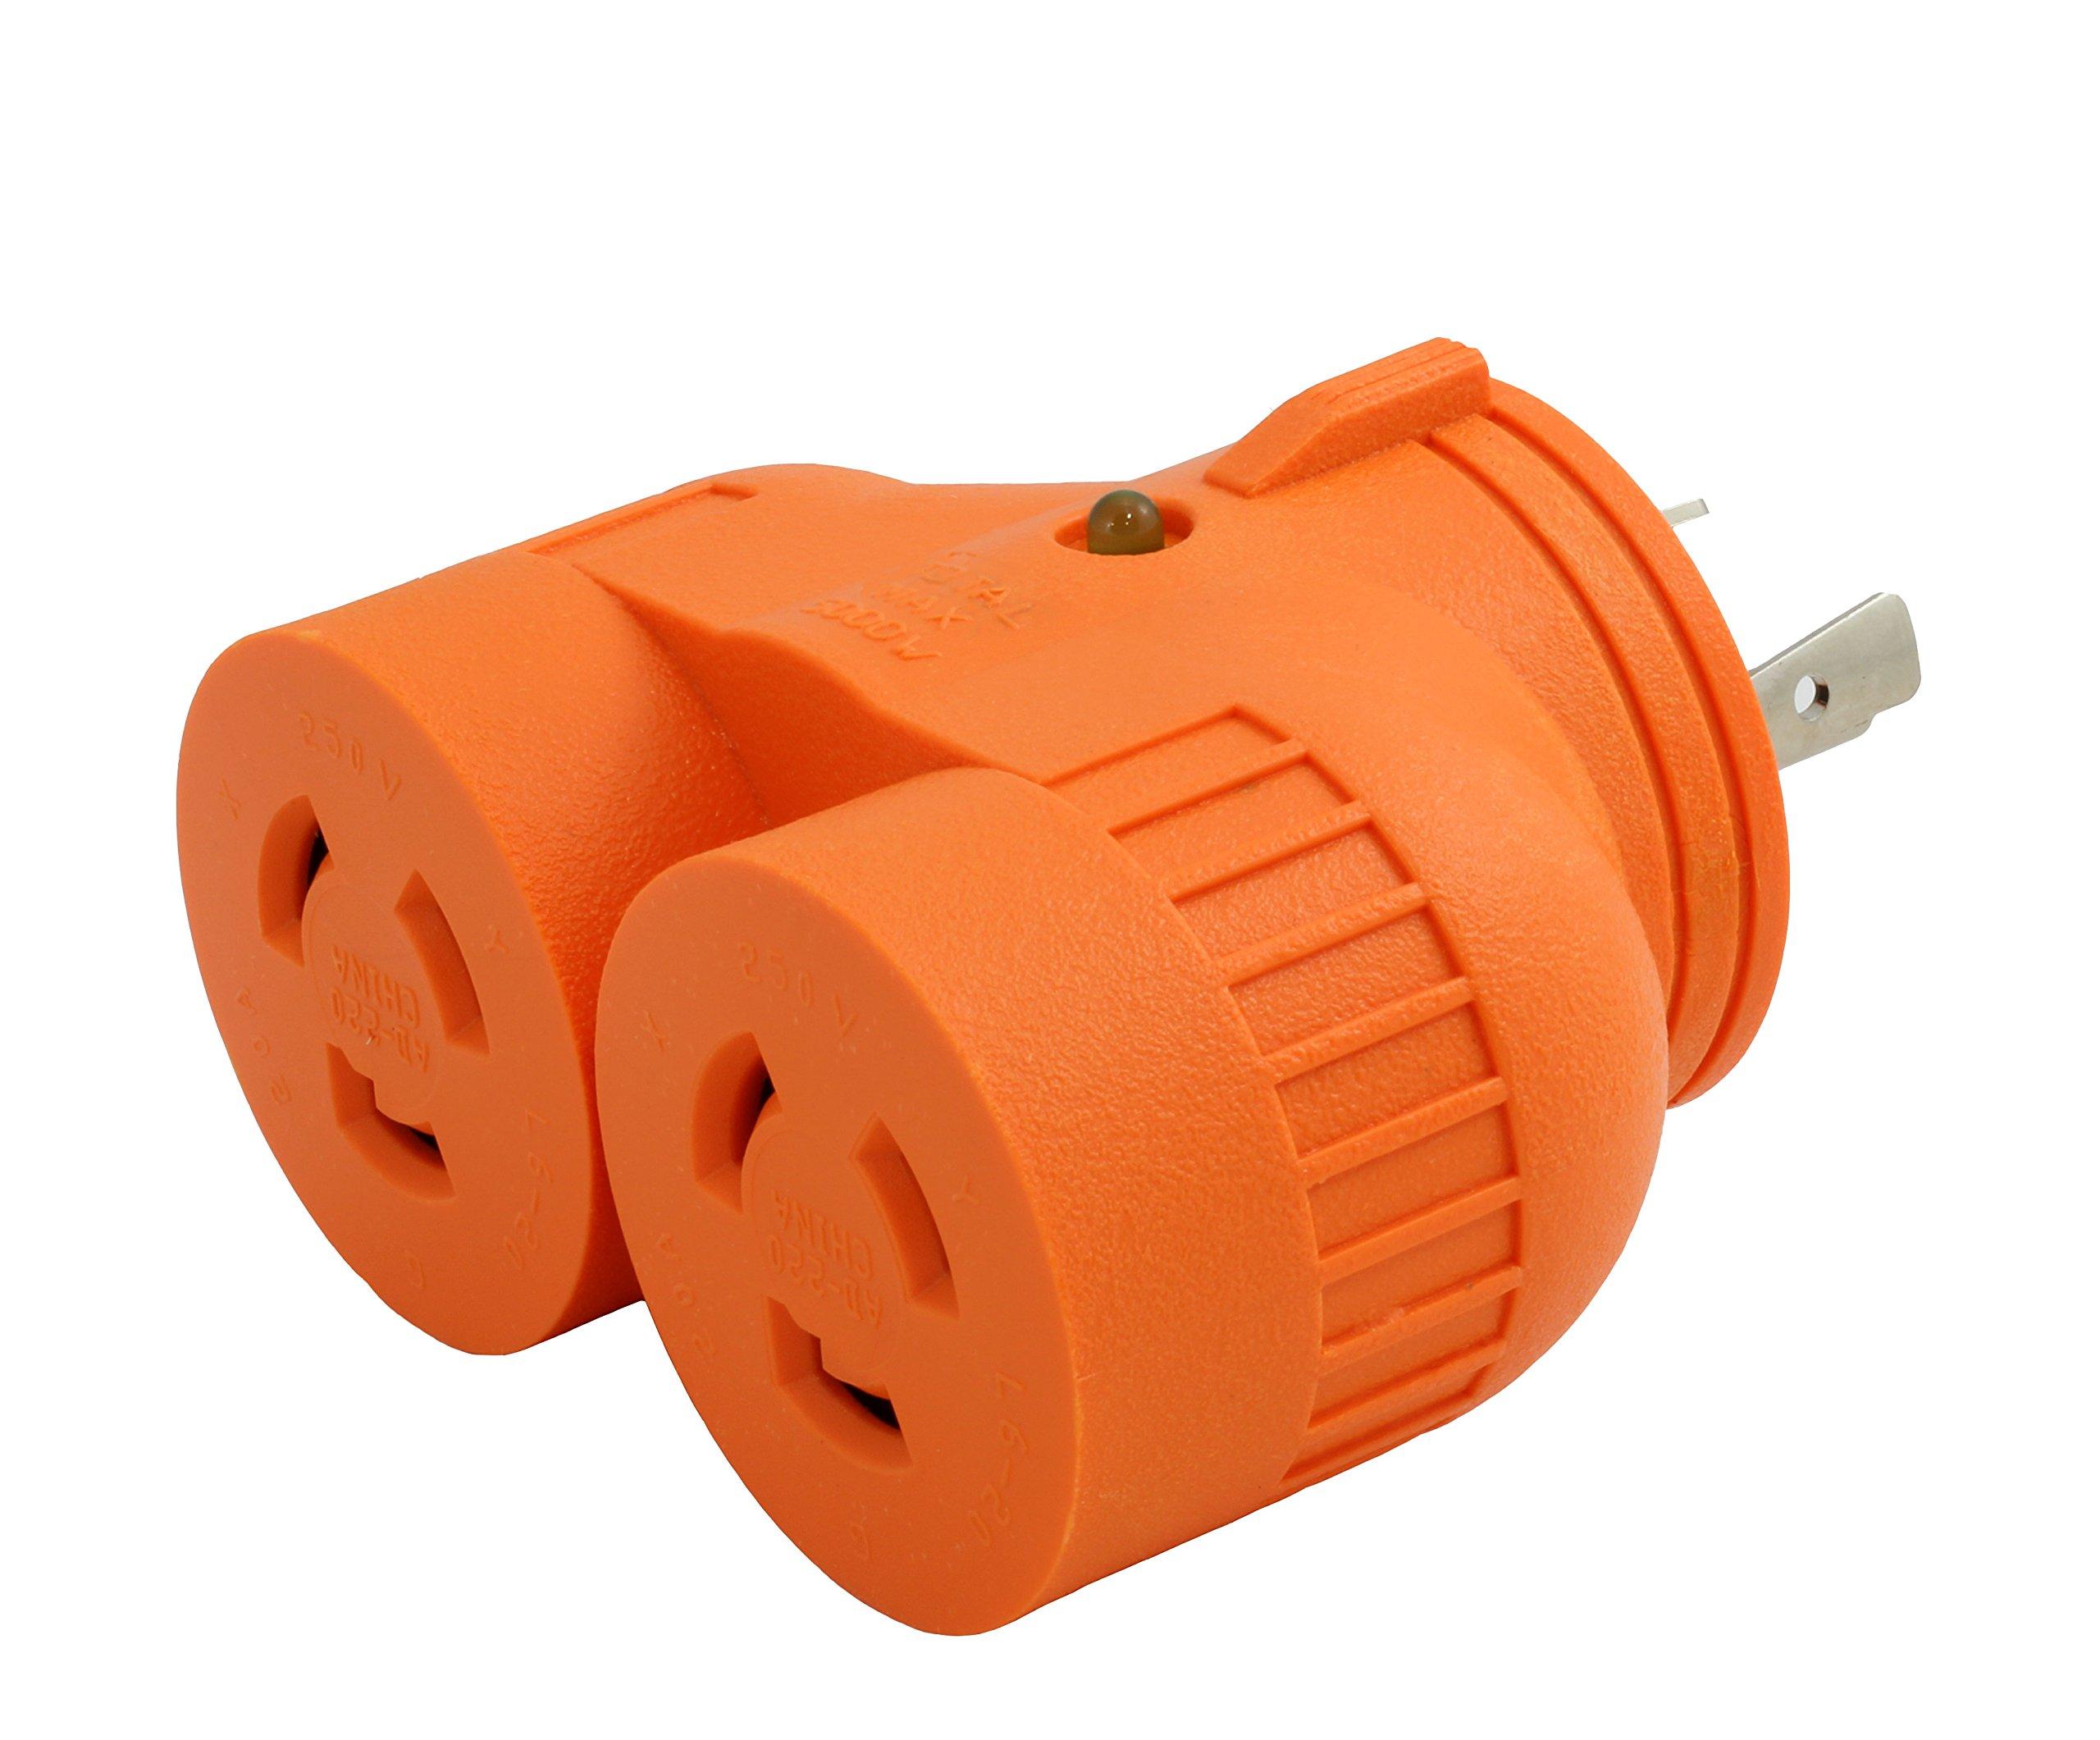 AC WORKS [ADVL620L620] V-DUO Adapter NEMA L6-20P 20Amp 250Volt 3-Prong Locking Plug to (2) L6-20R 20Amp 250Volt Locking Female Connectors